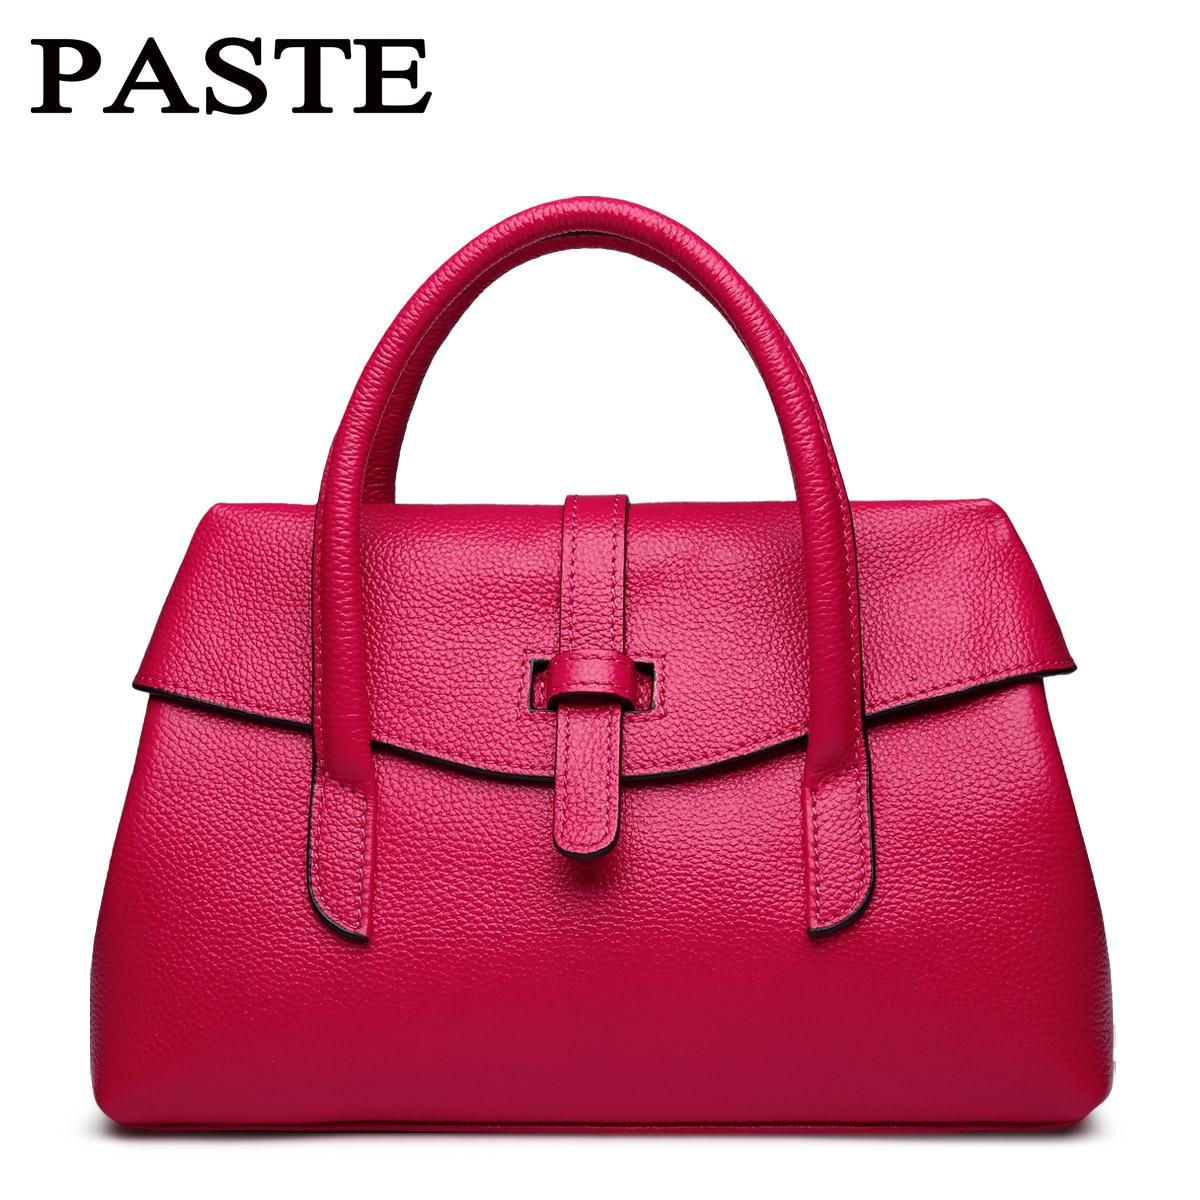 Women Genuine Leather Handbags Small Messenger Bag Elegant Design Beige white Black Hot pink orange 5p0303